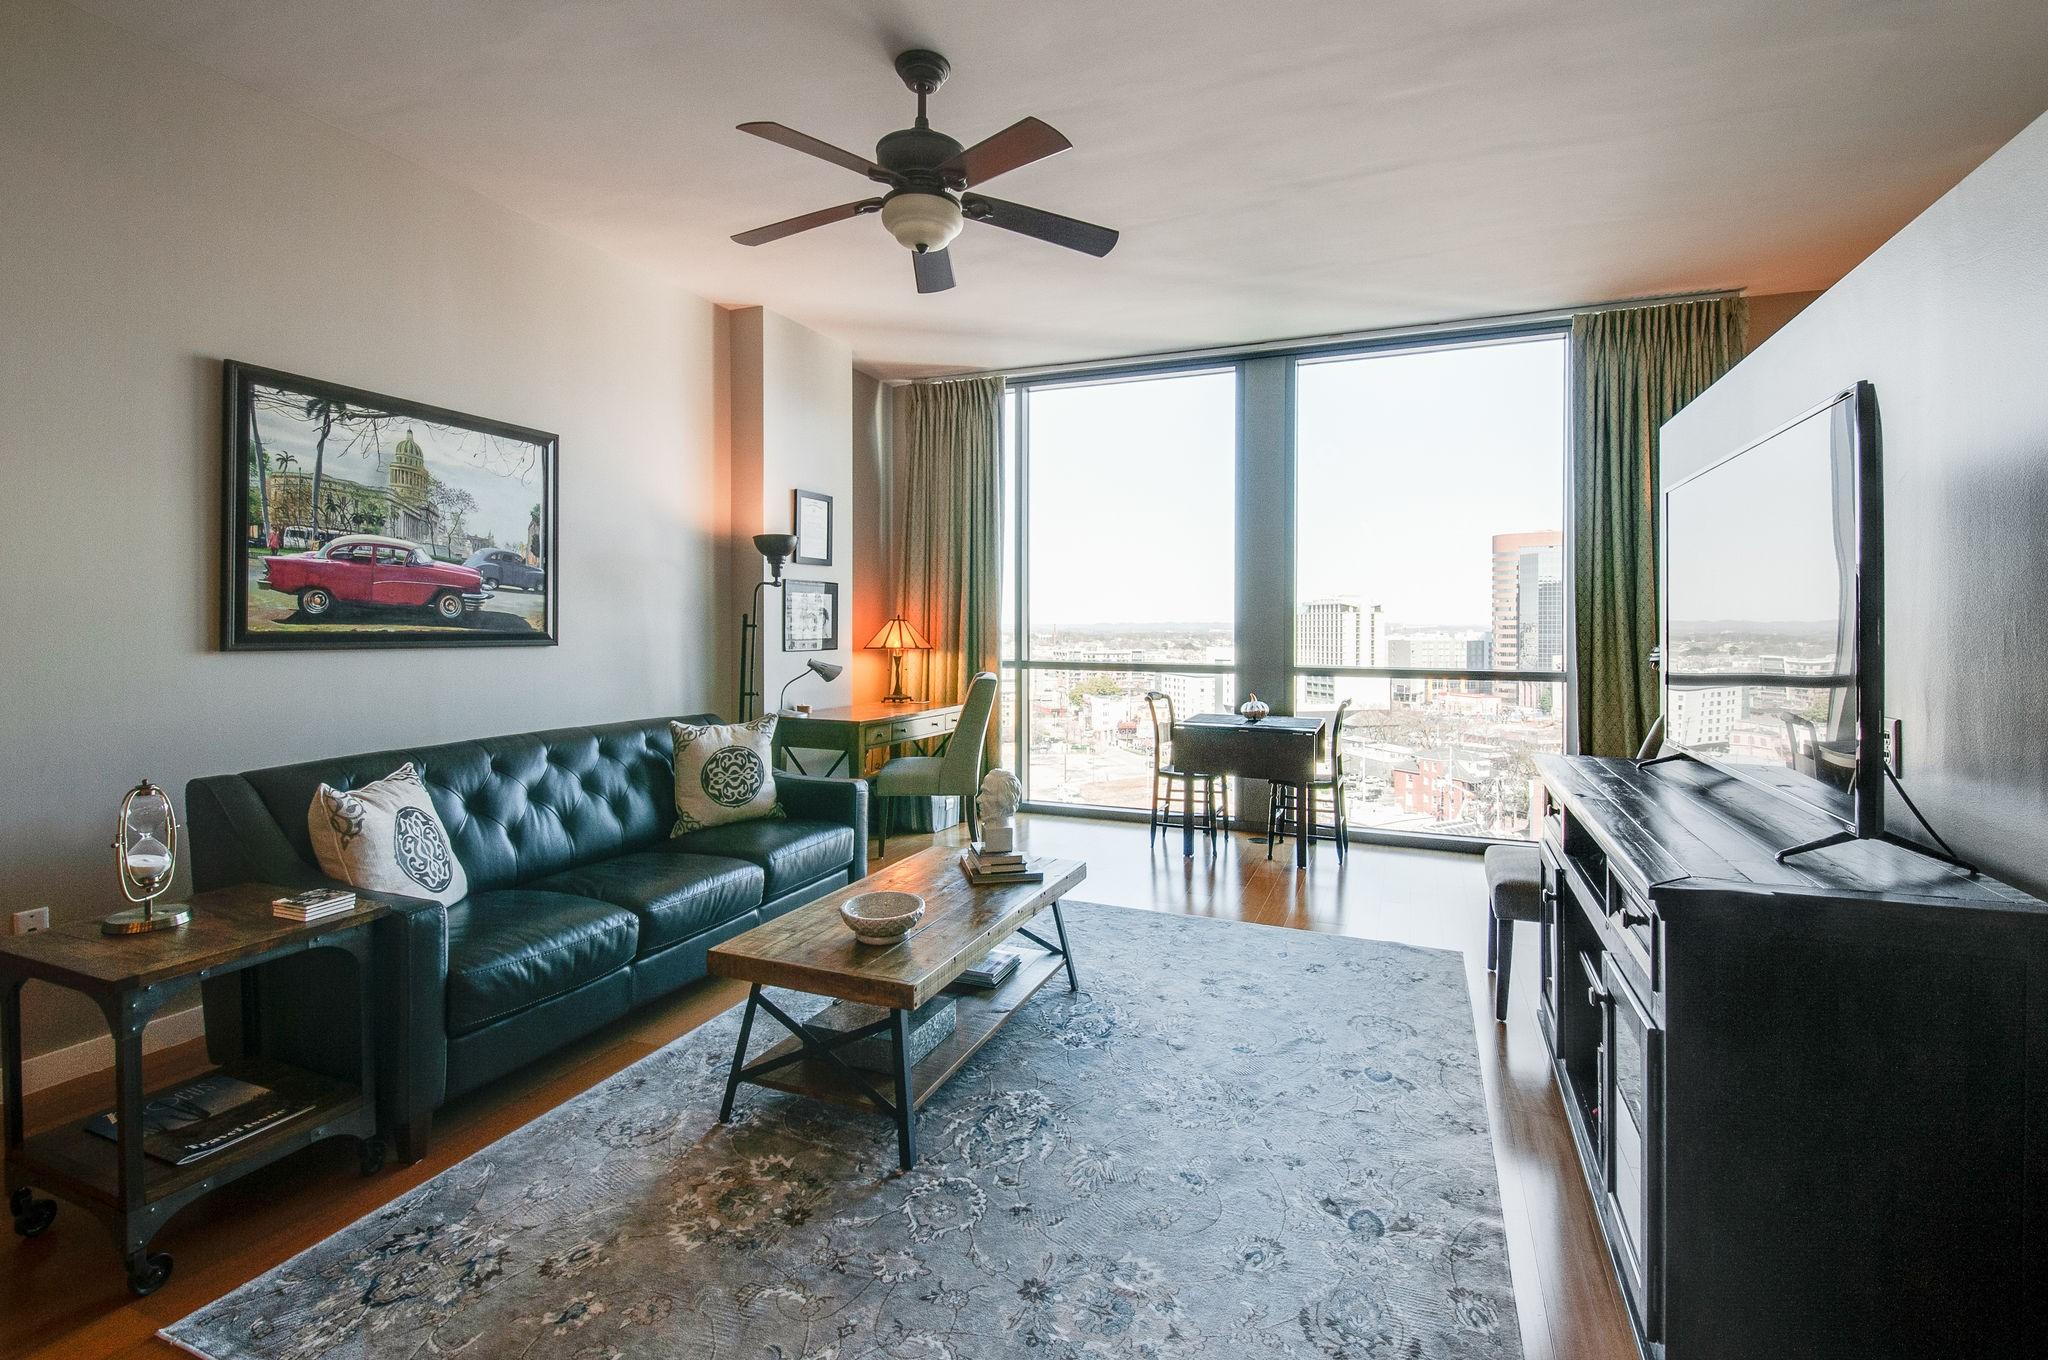 900 20th Ave., S, Nashville, TN 37212 - Nashville, TN real estate listing